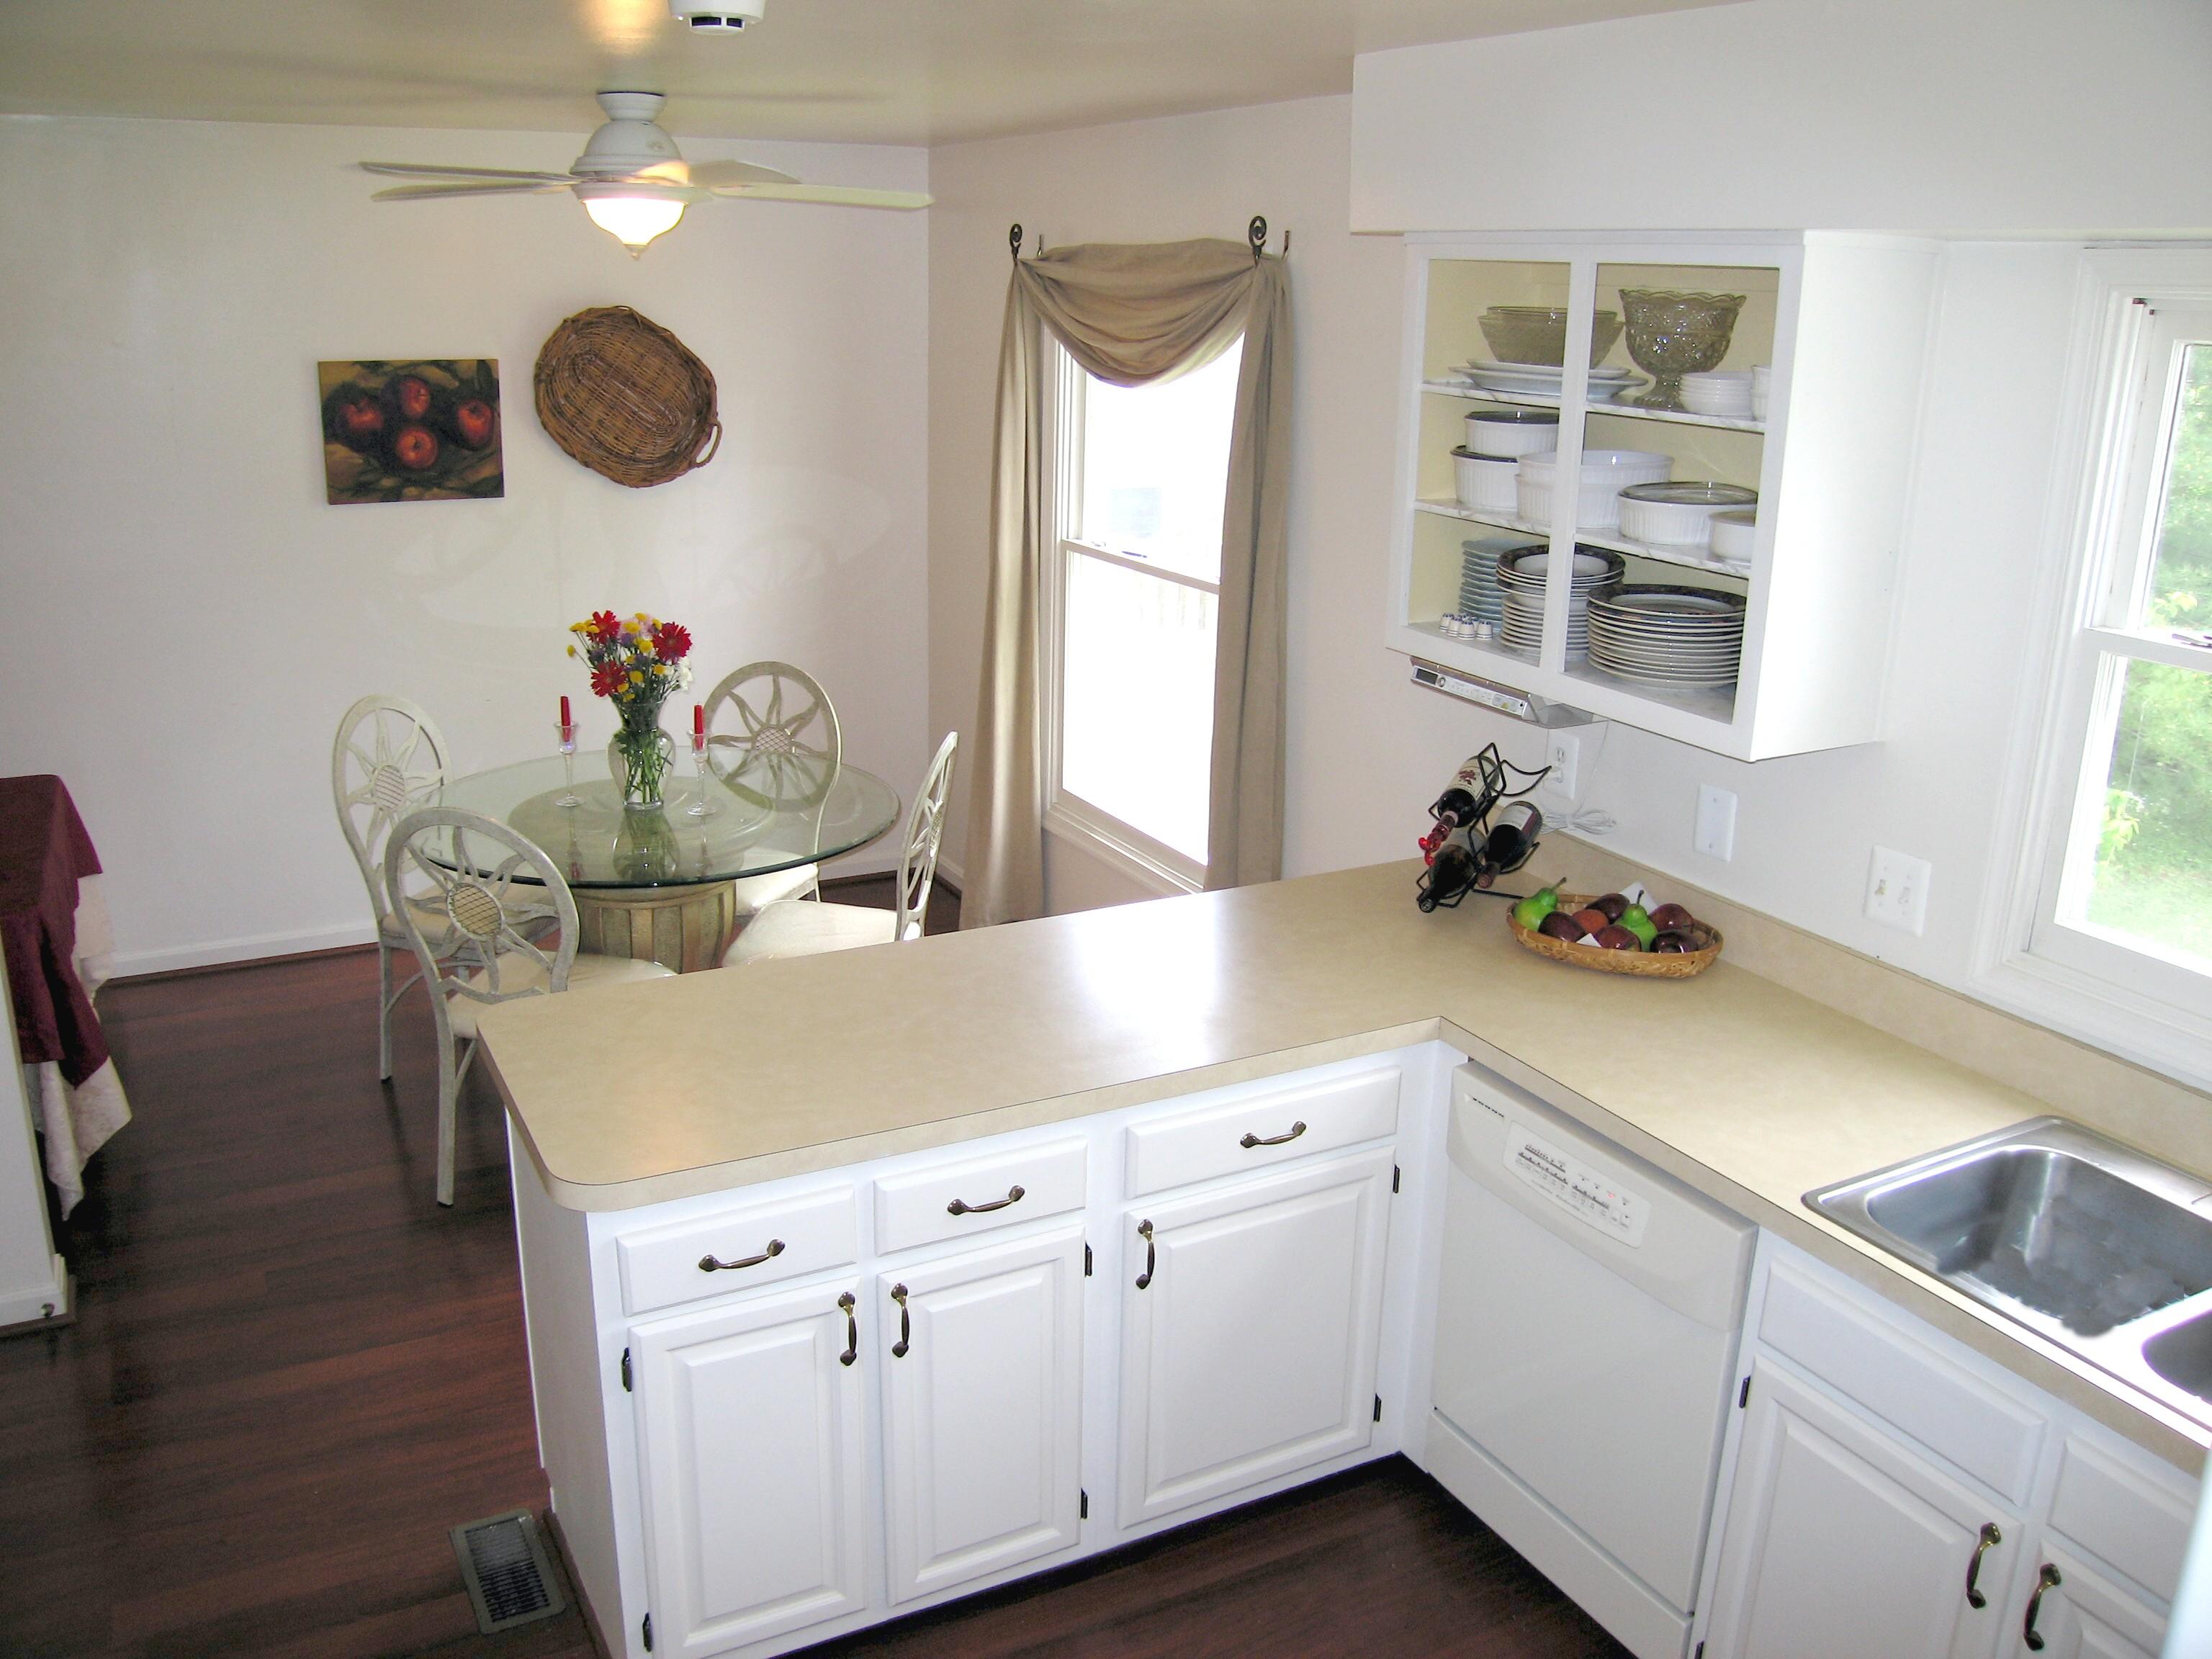 Kitchenaid Ceramic Cooktop